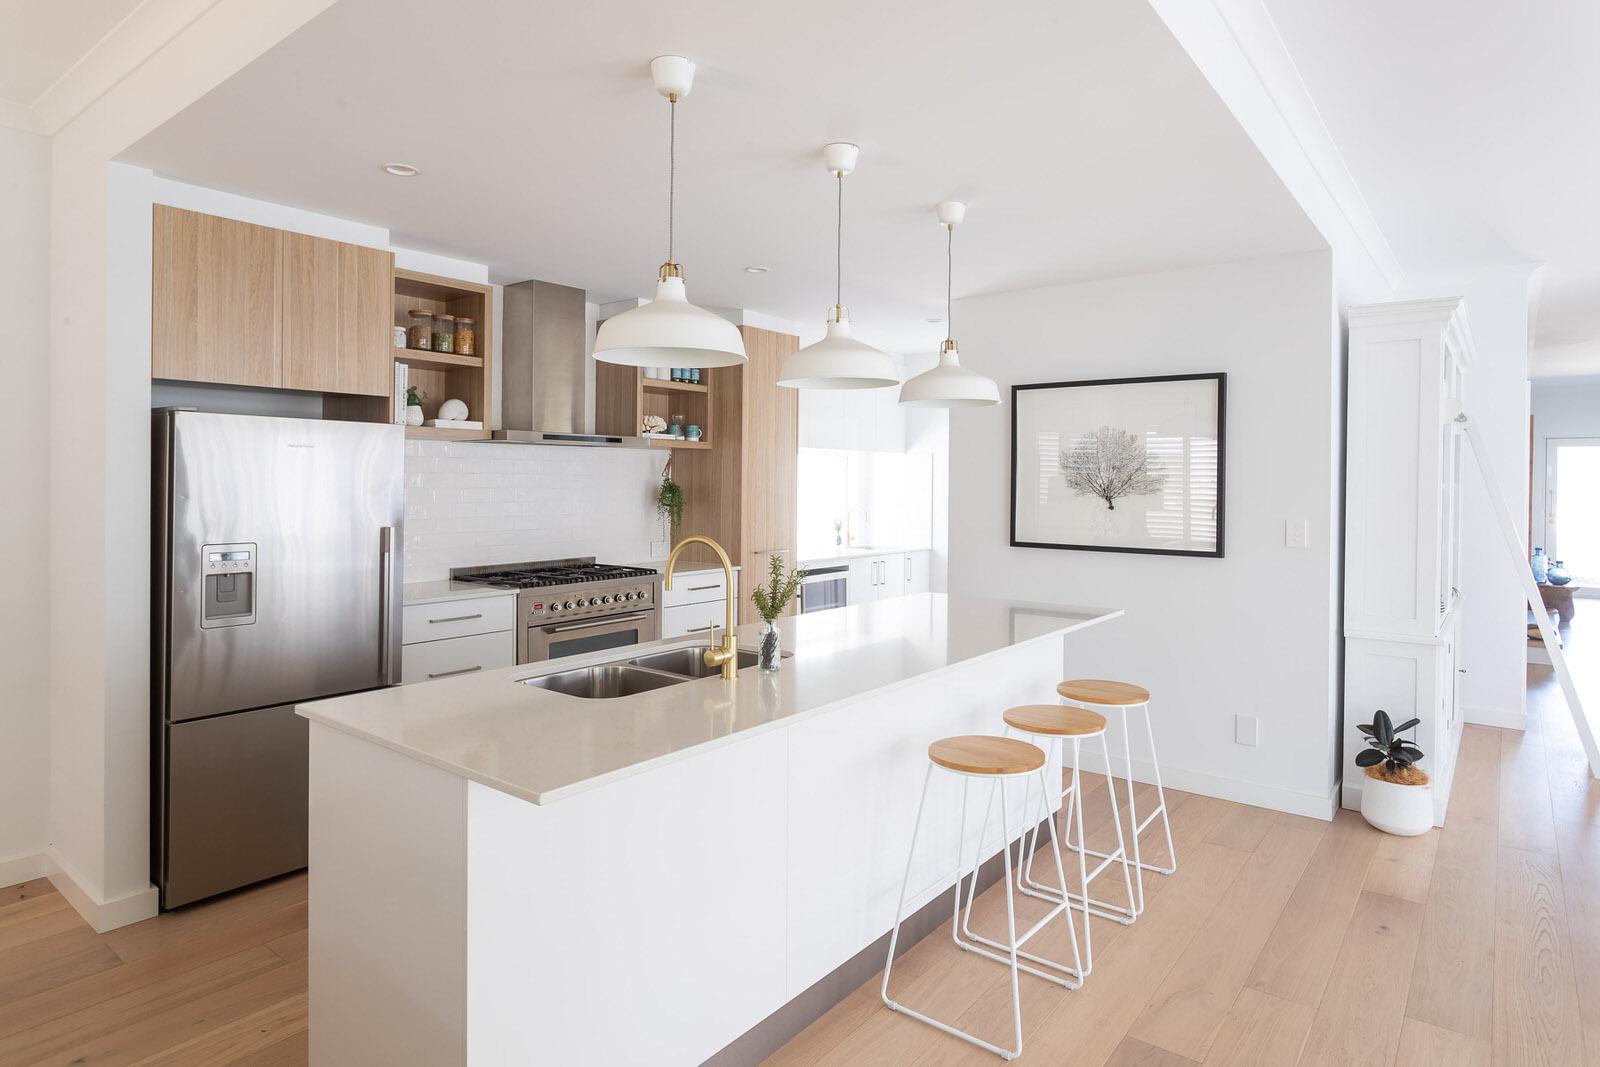 Ammon_Creative-Interior_Photography-Real_Estate-Hatch_Interiors-0001.jpg